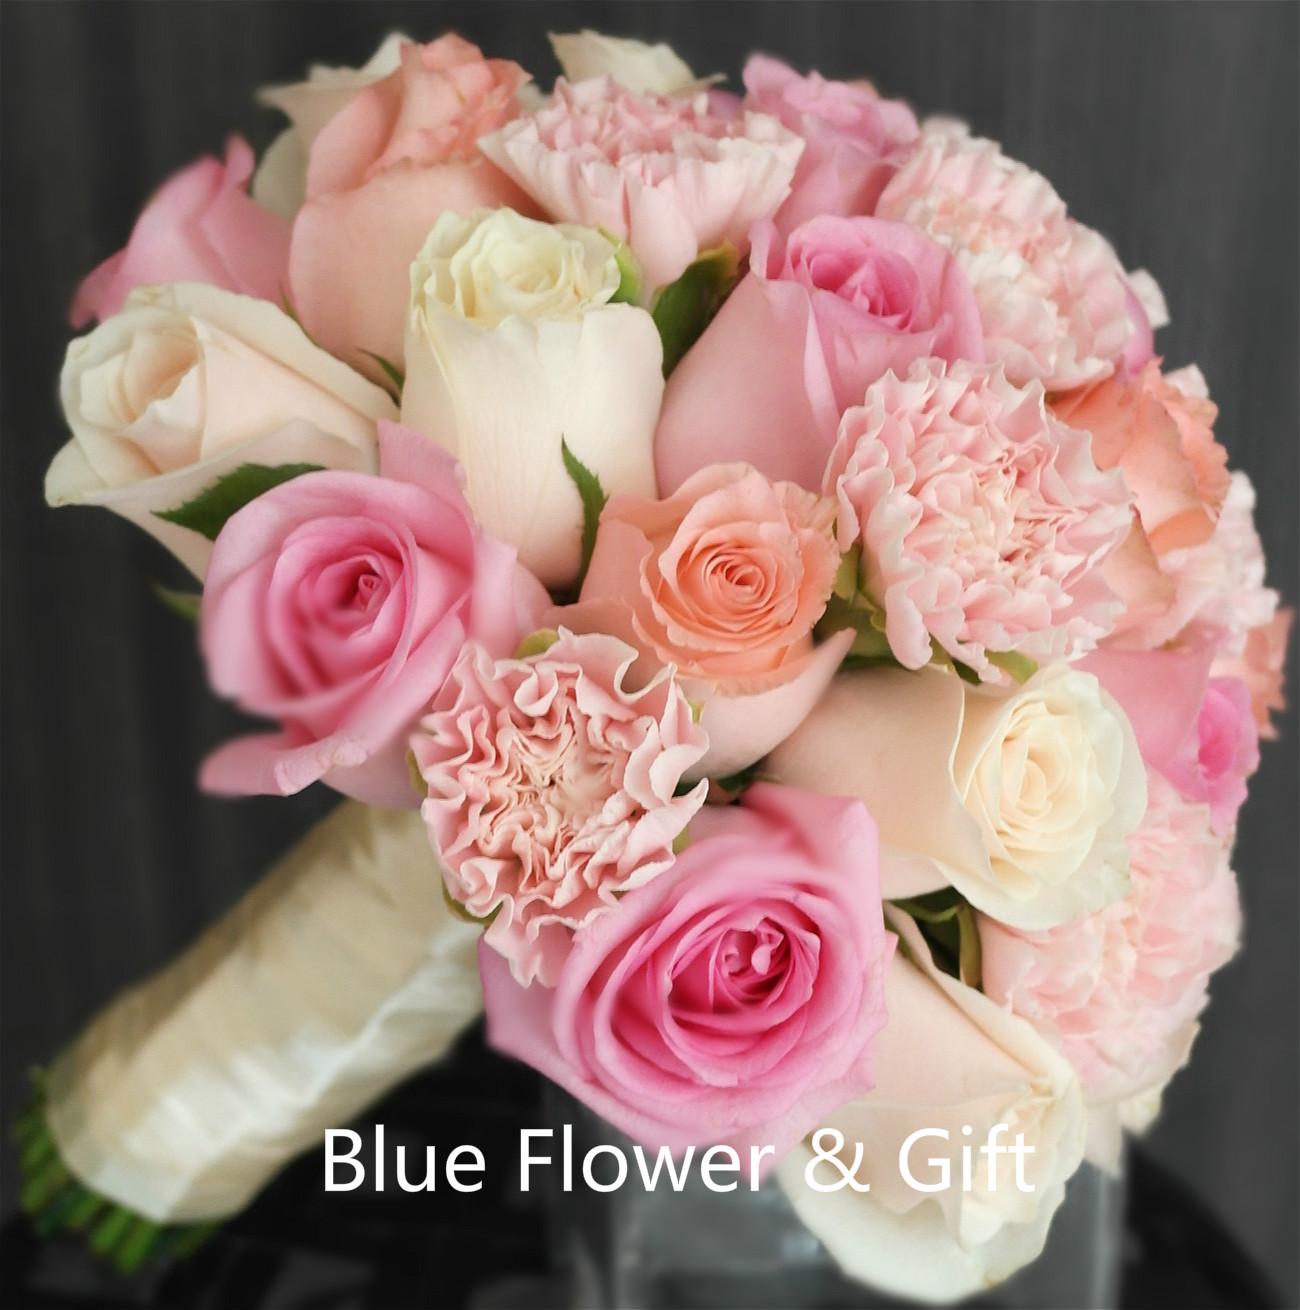 Penang florist online flower shop florist malaysia florist rose hand bouquetbridal 008 izmirmasajfo